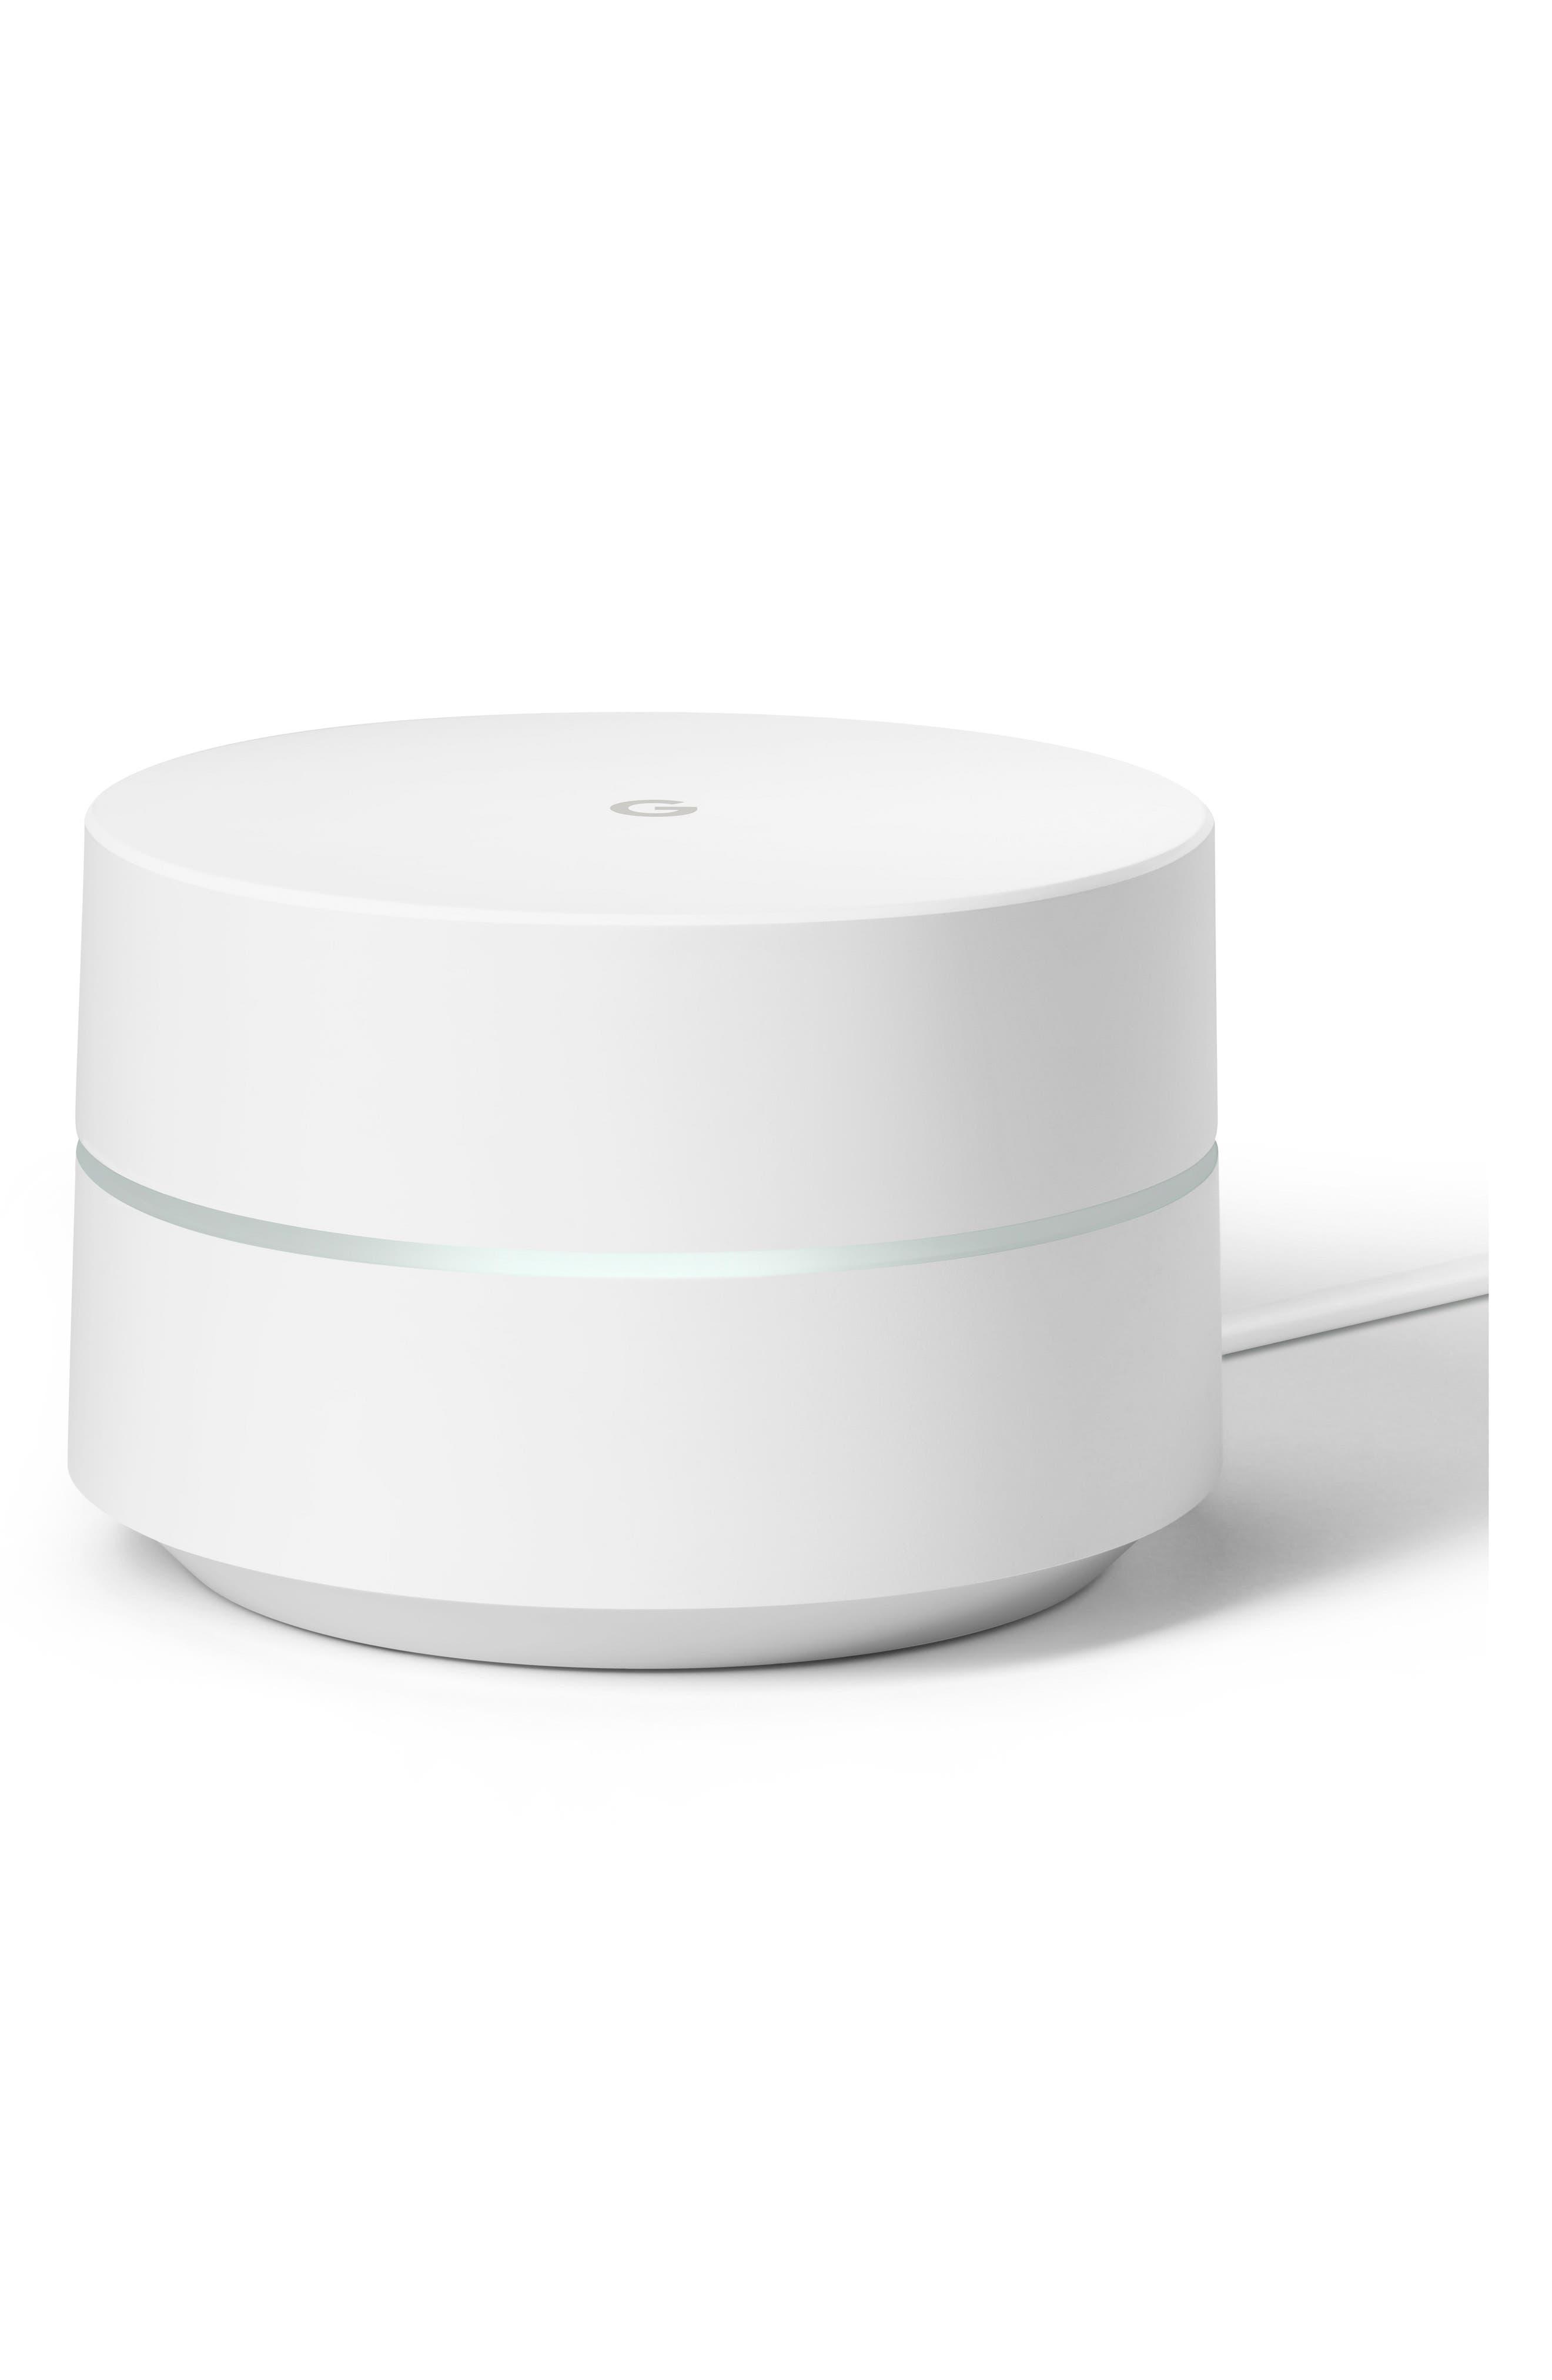 Wi-Fi,                             Main thumbnail 1, color,                             White